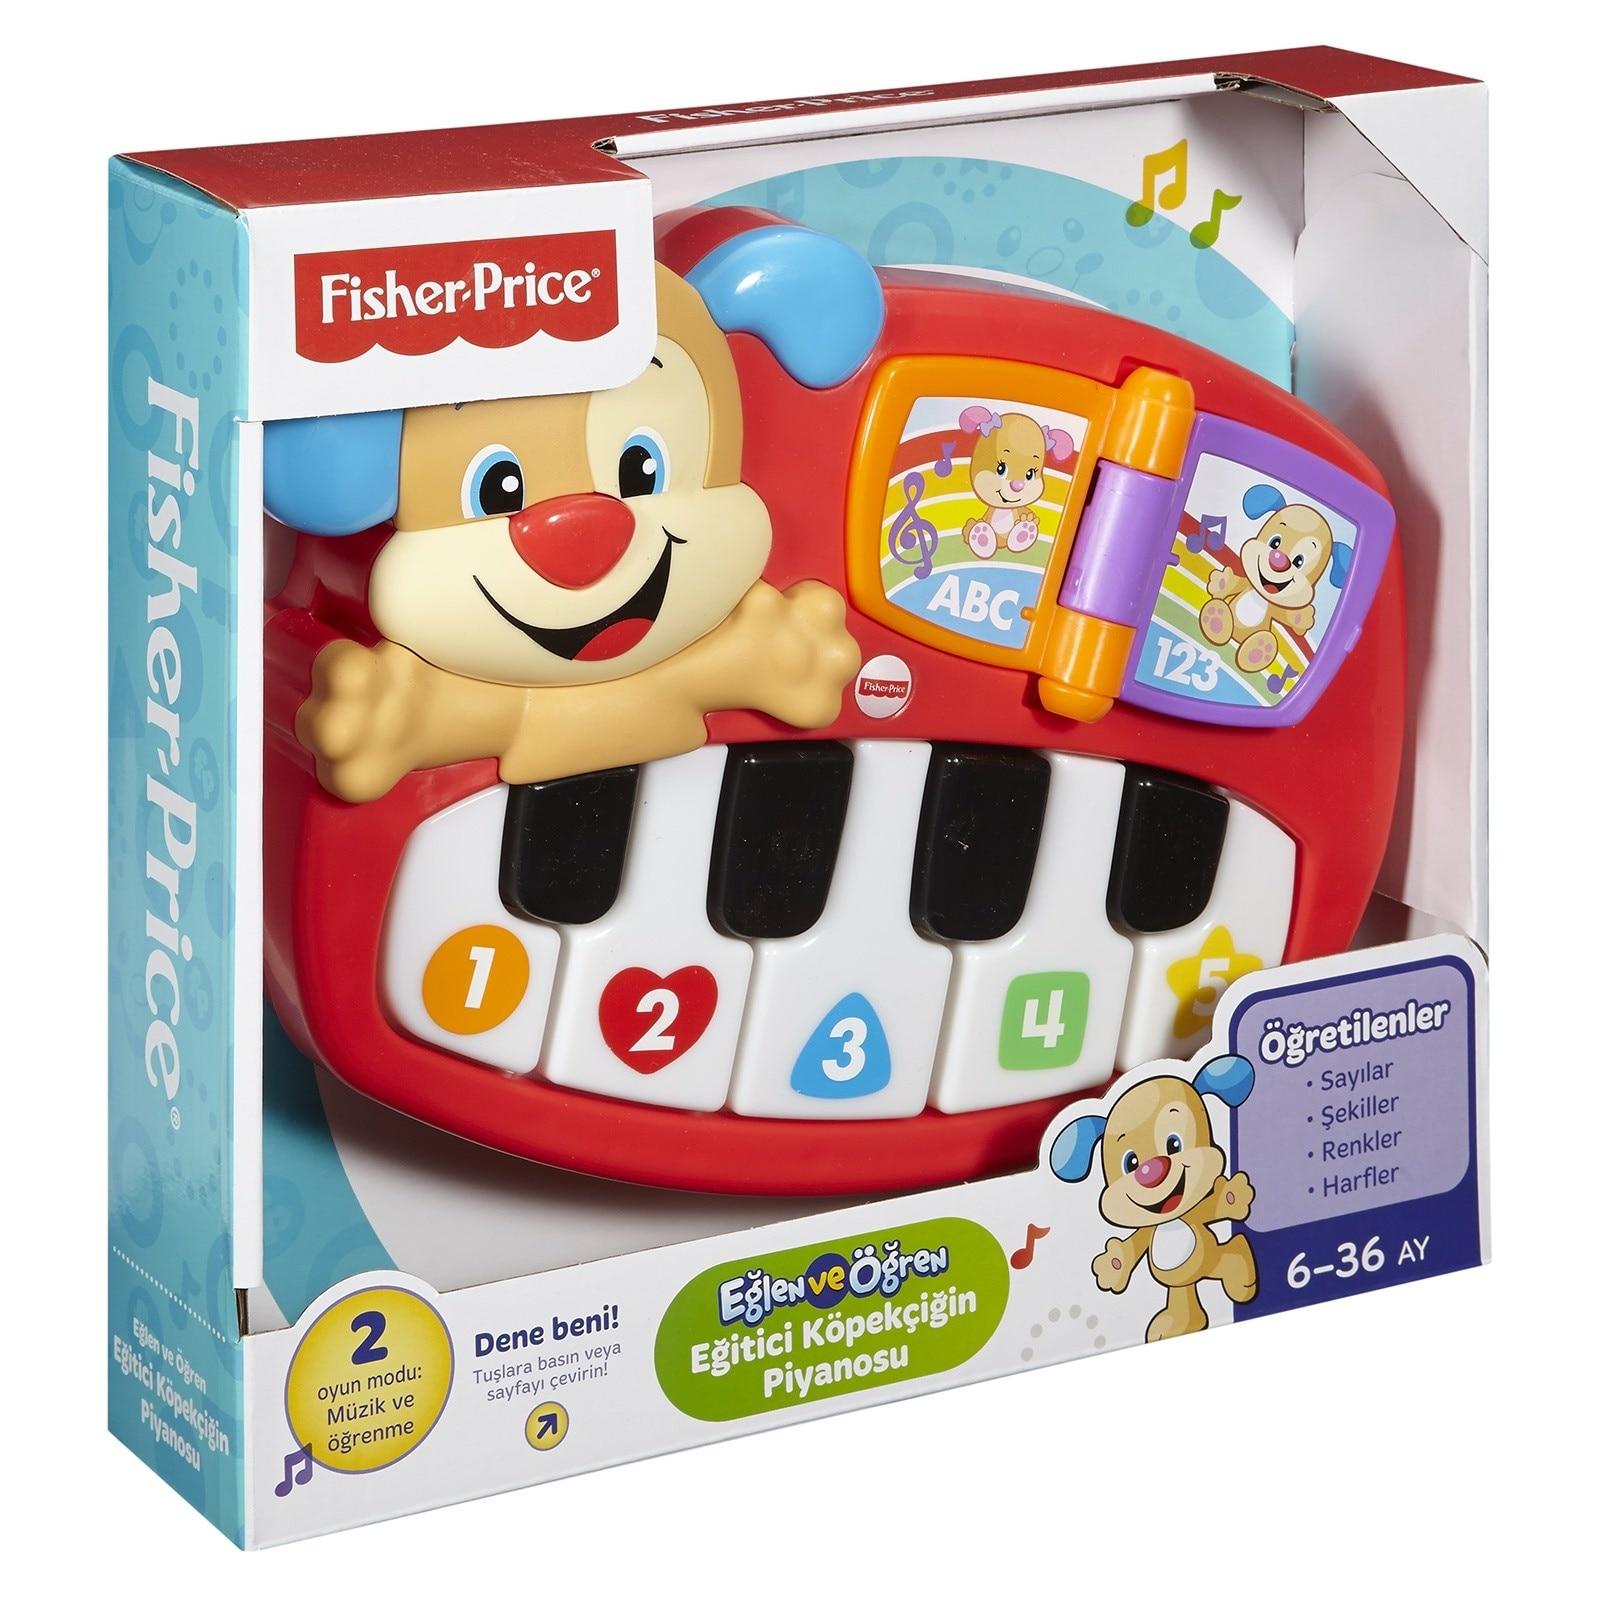 Ebebek Fisher Price Educational Puppy Piano - Turkish